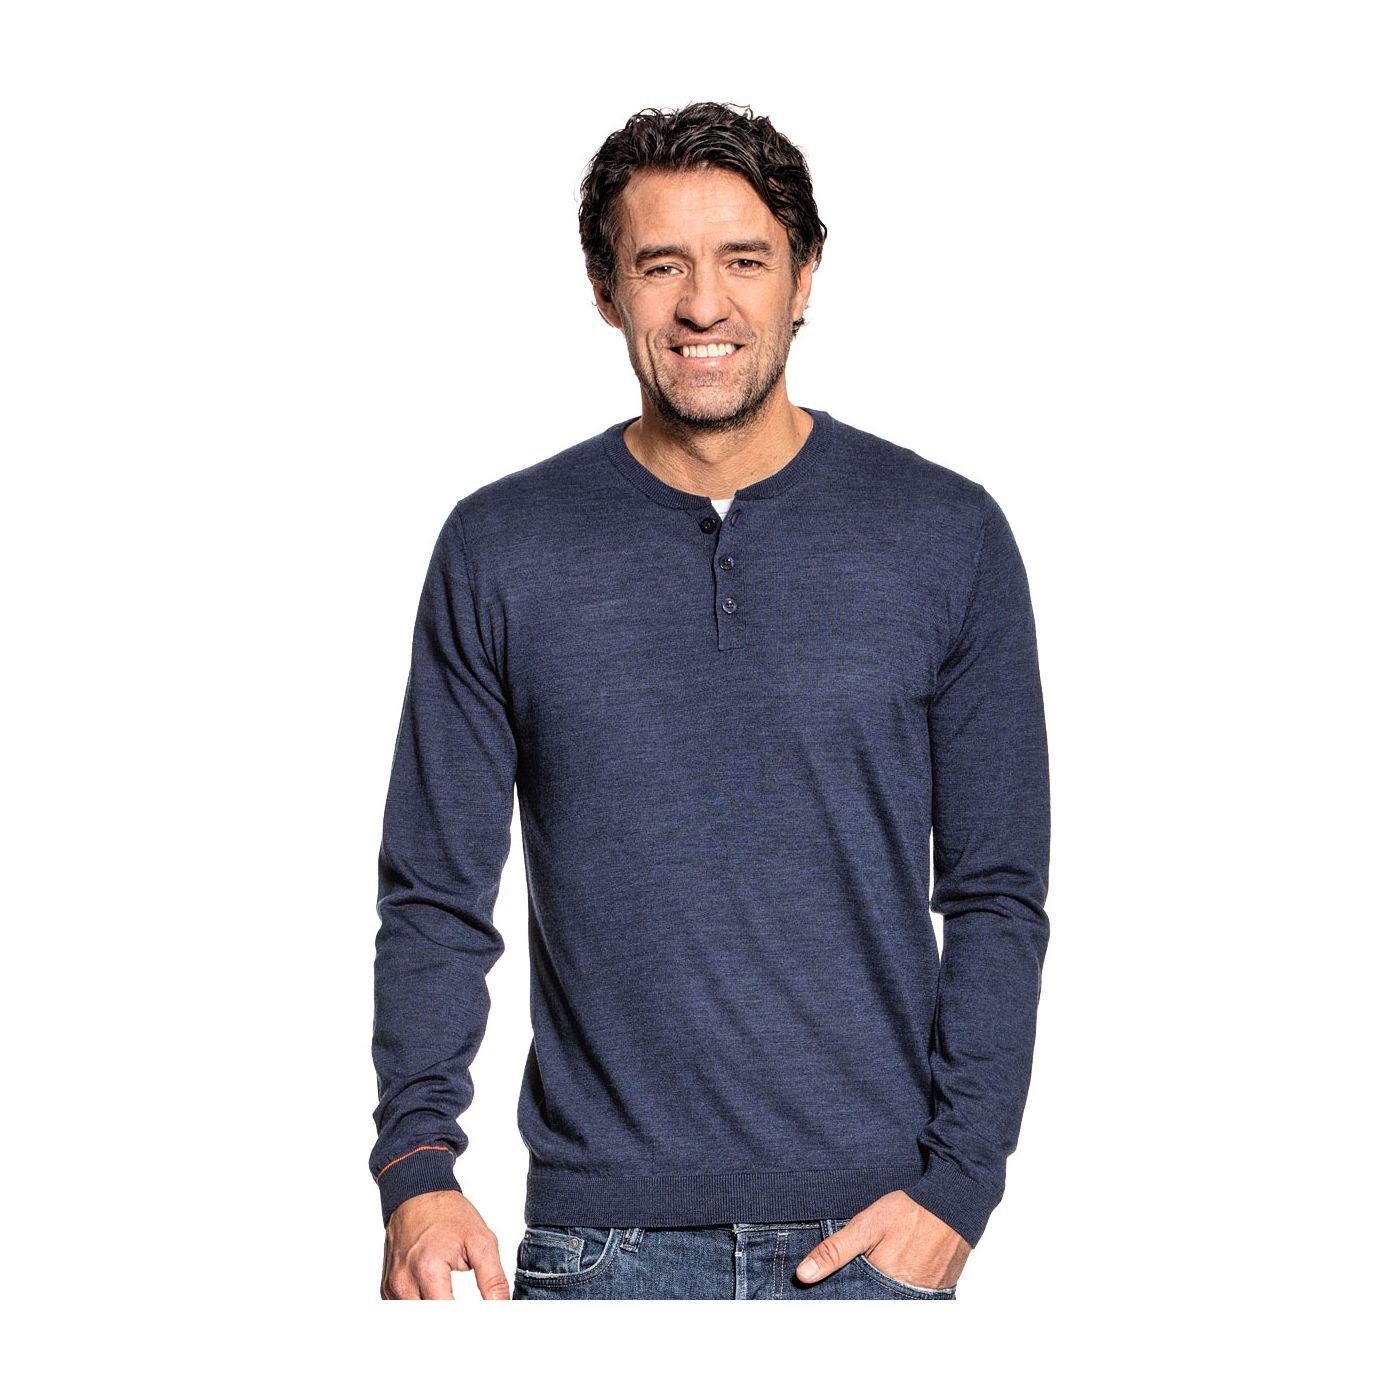 Henley long sleeve for men made of Merino wool in Blue